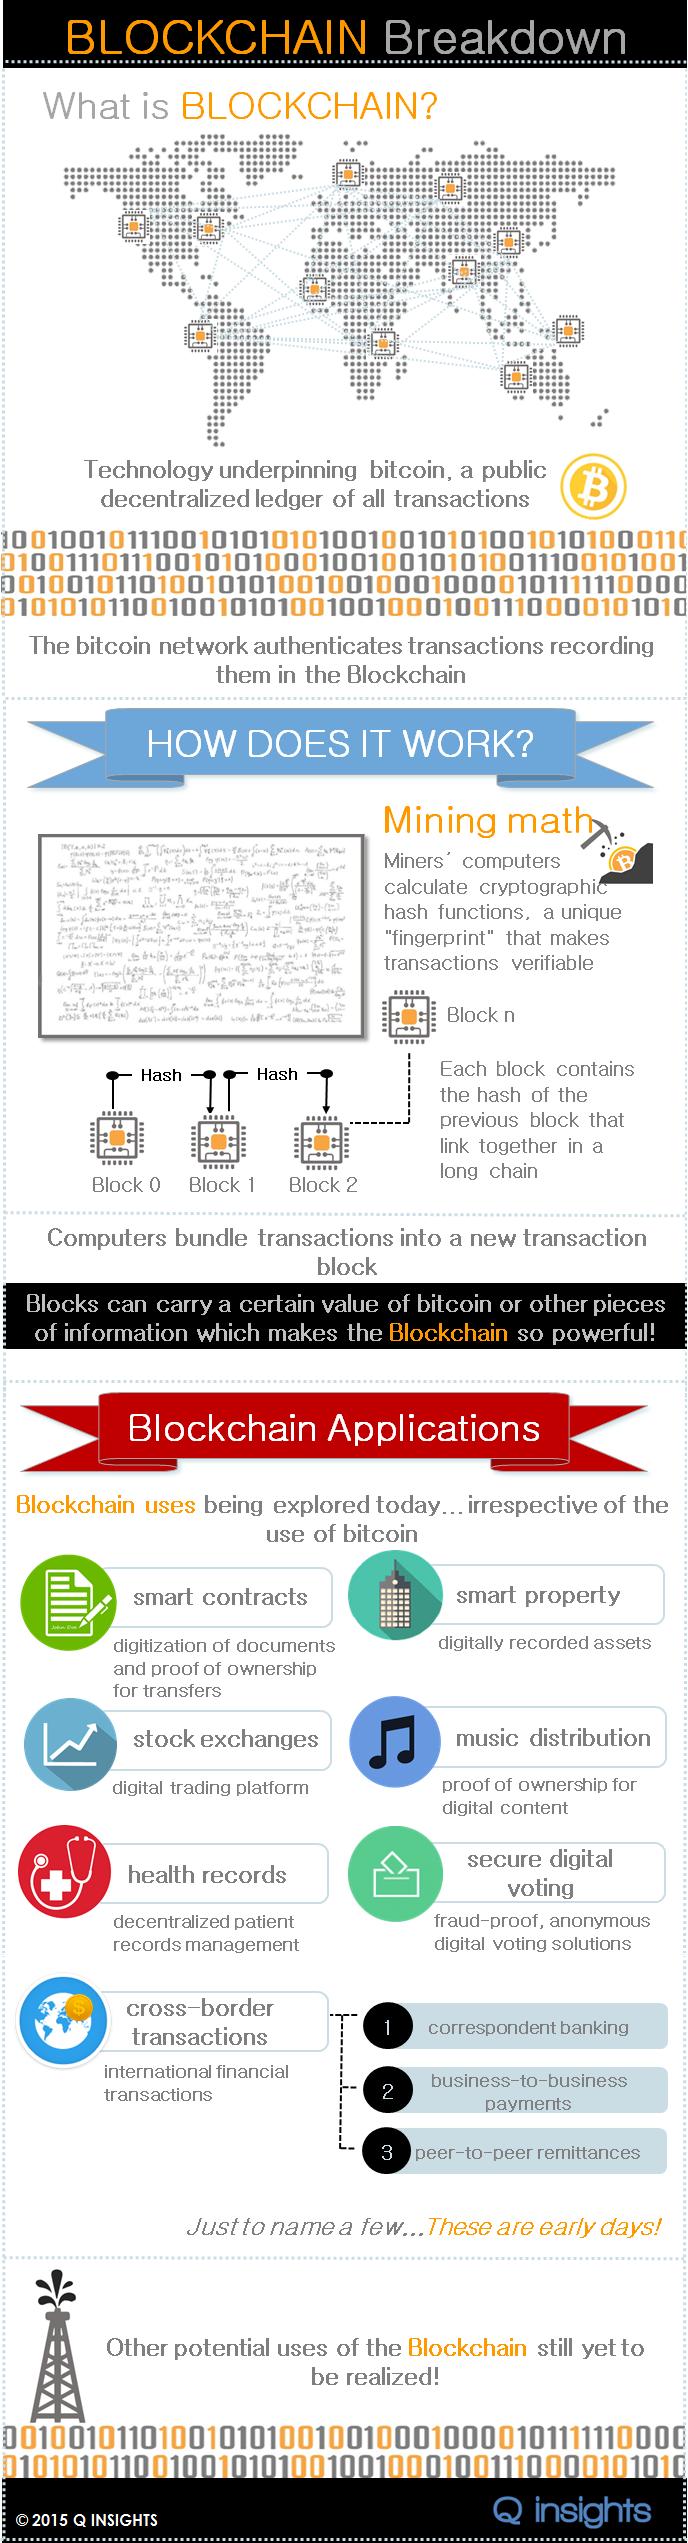 Blockchain-Infographic-2015-Q-INSIGHTS